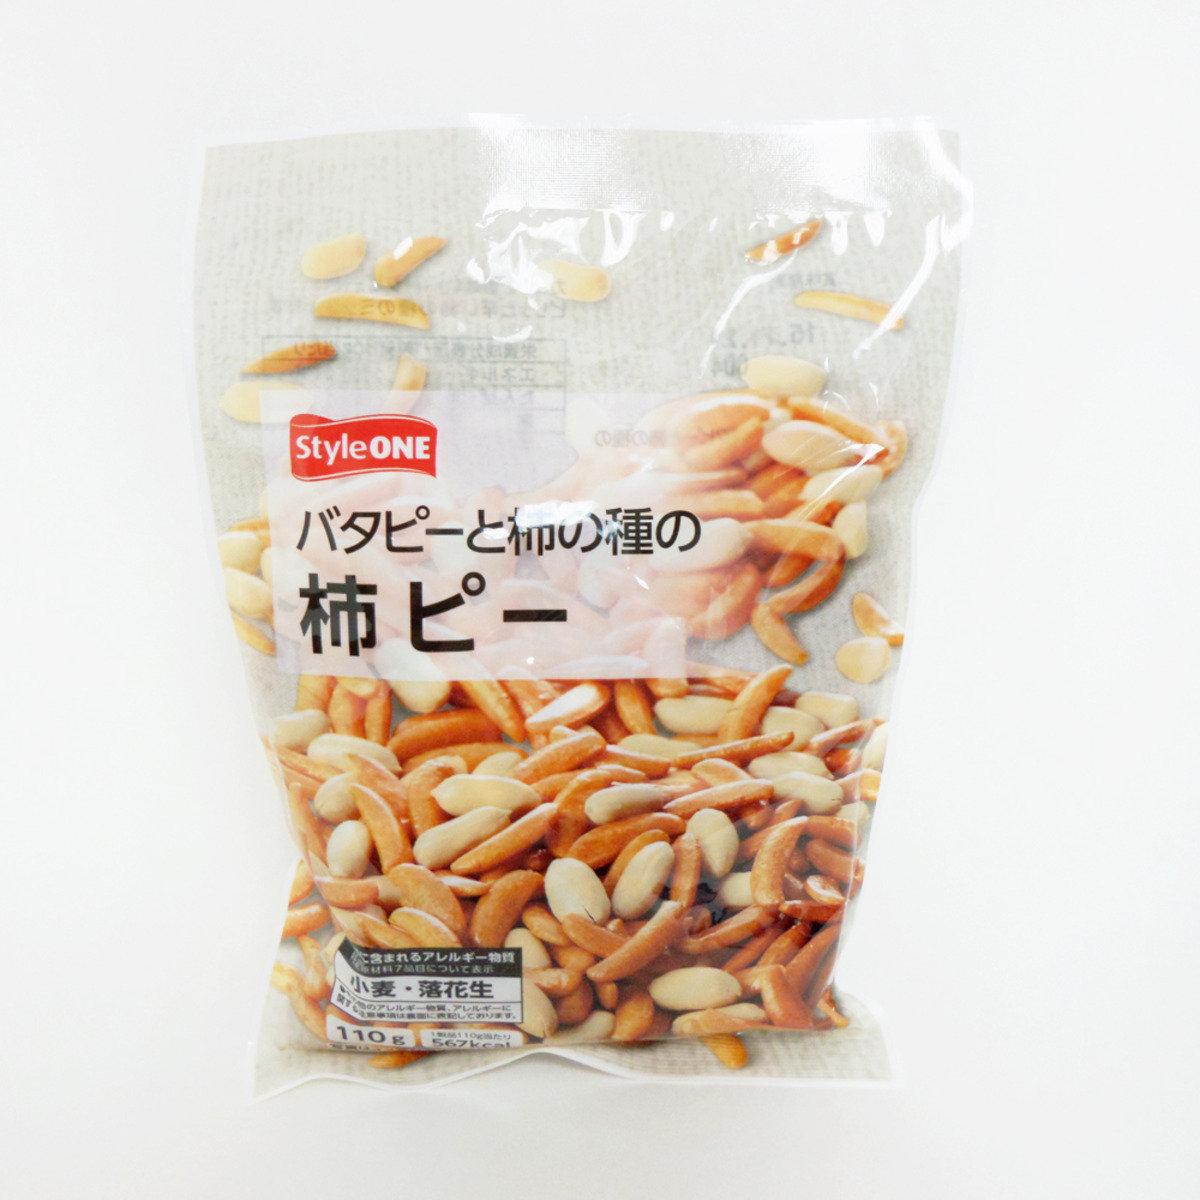 Style One 柿之種米菓+花生